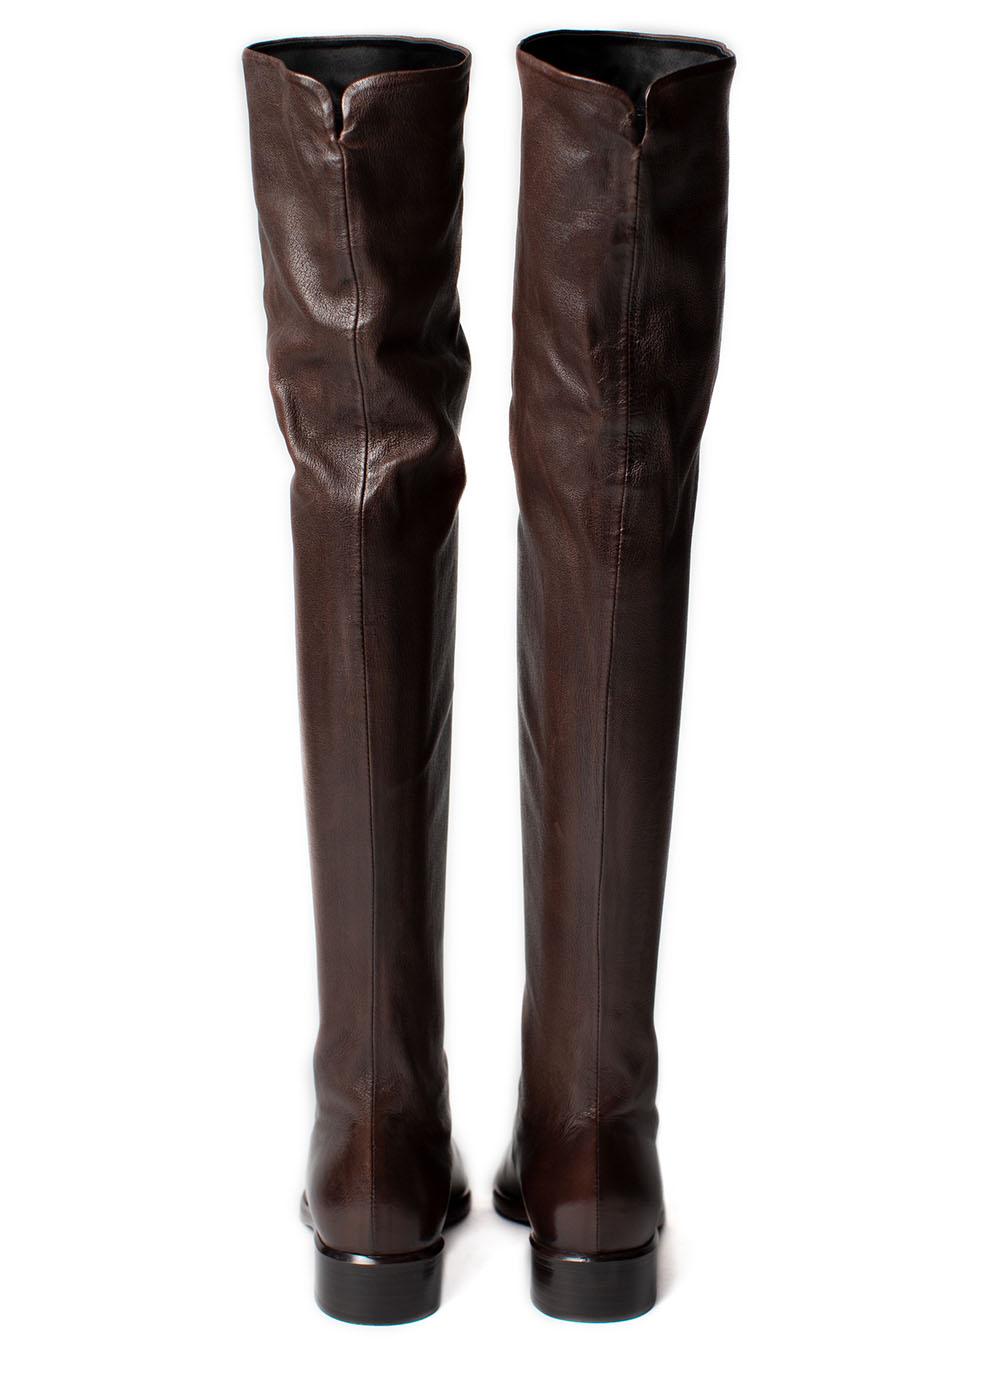 Overknee Boots Nappa leather, dark brown